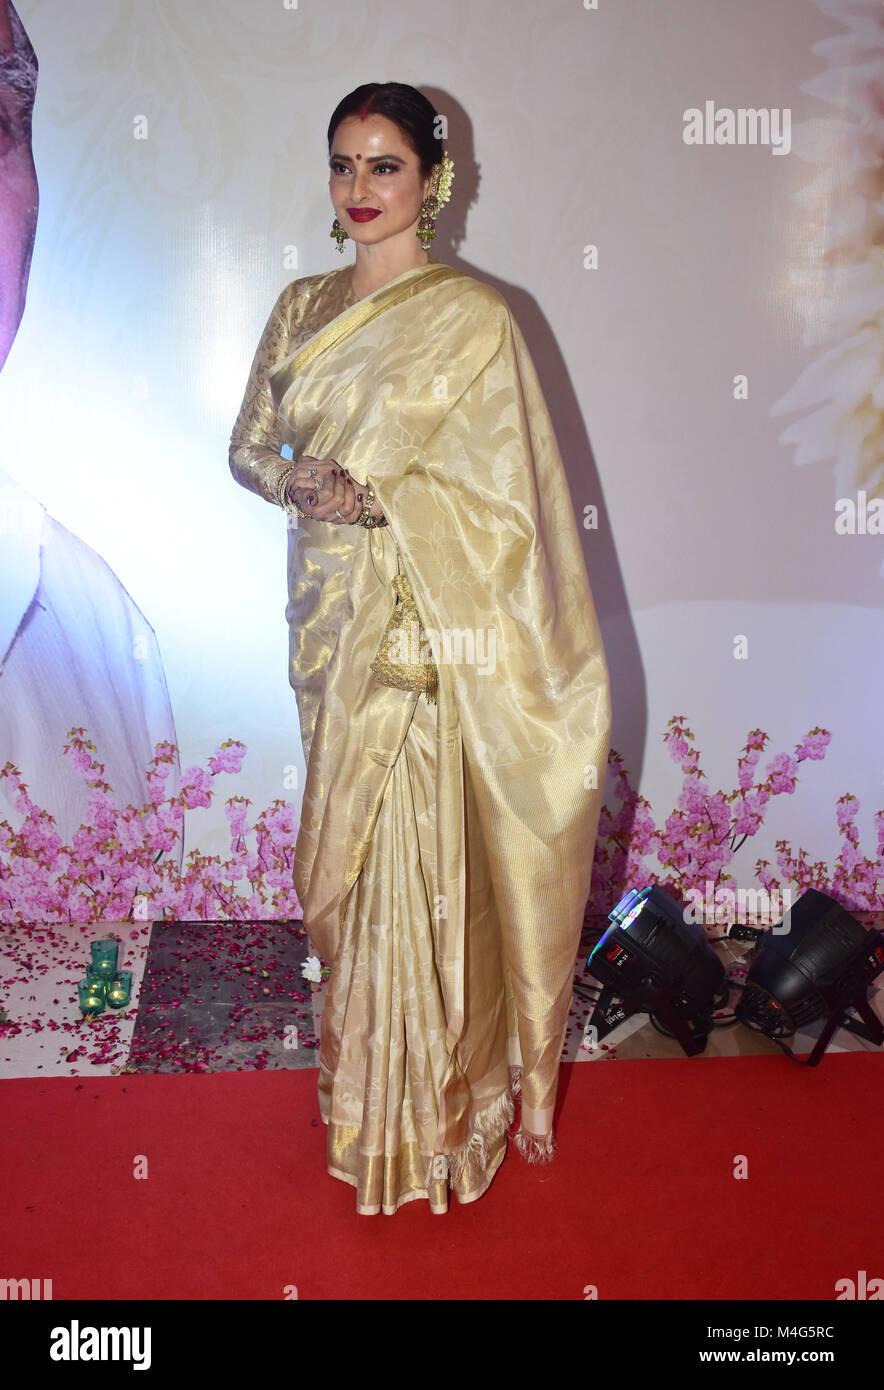 Mumbai, India  16th Feb, 2018  Indian actress Rekha present